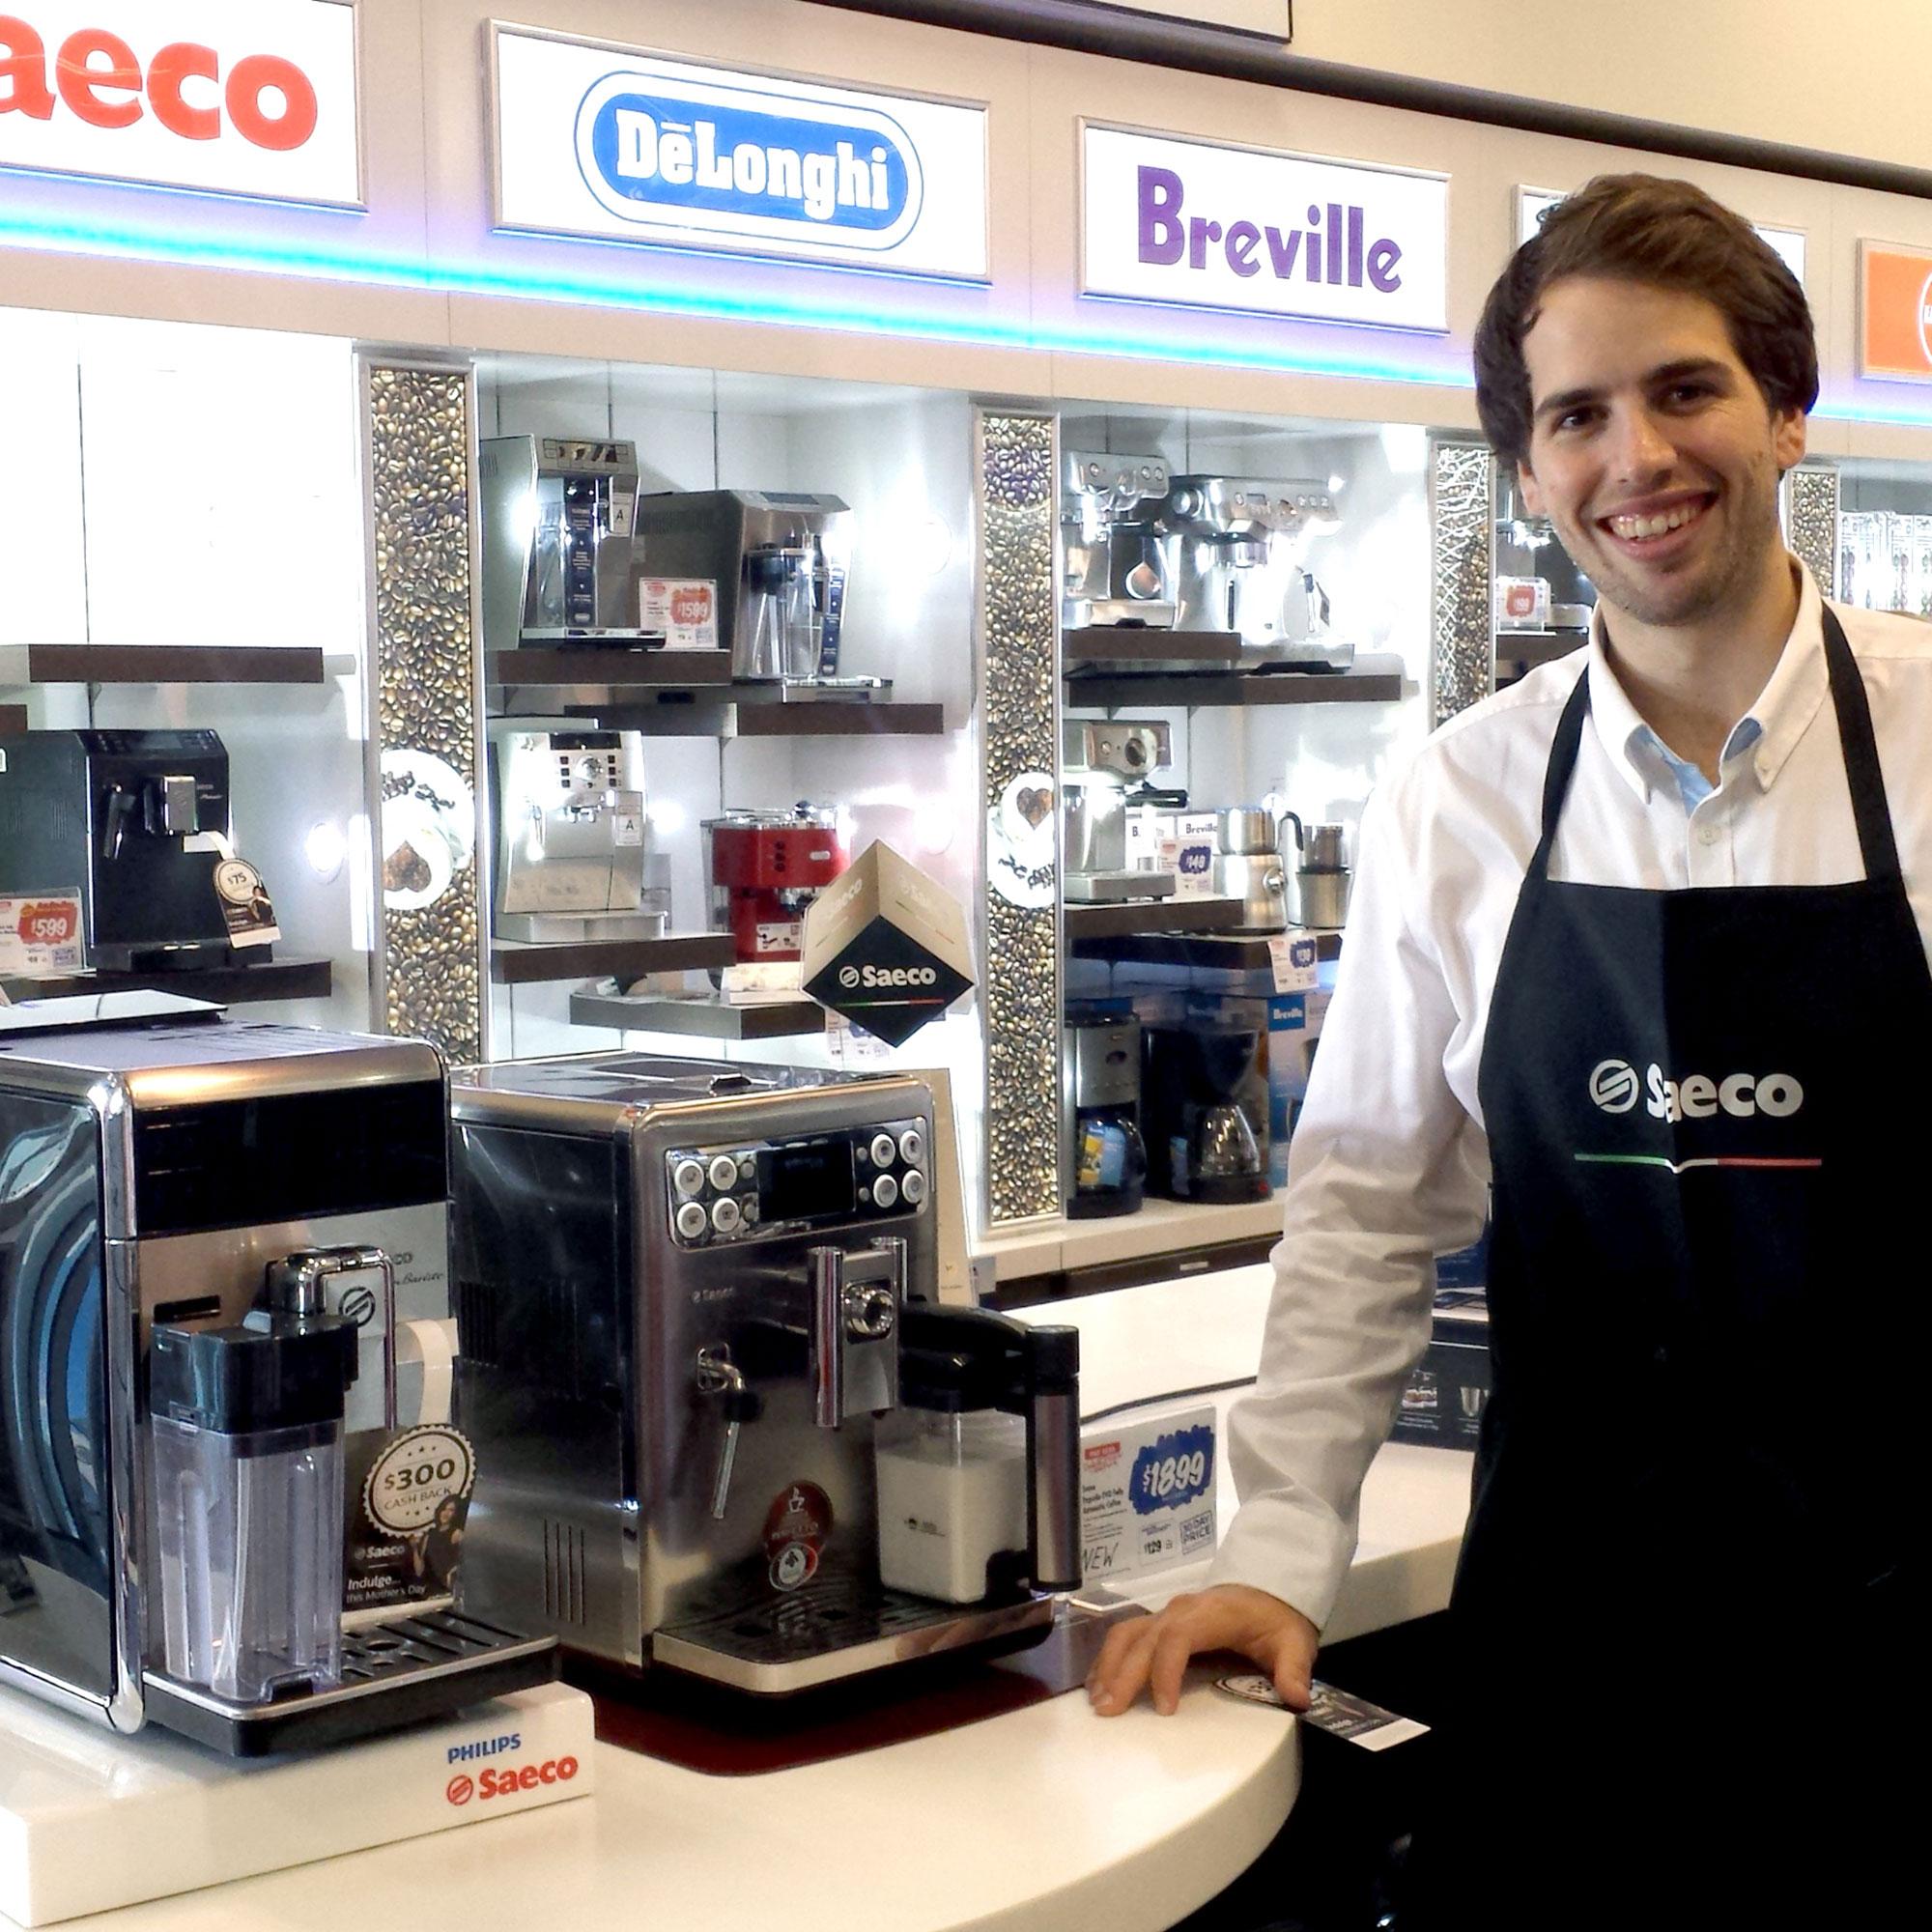 Philips 'Saeco' Coffee Machines